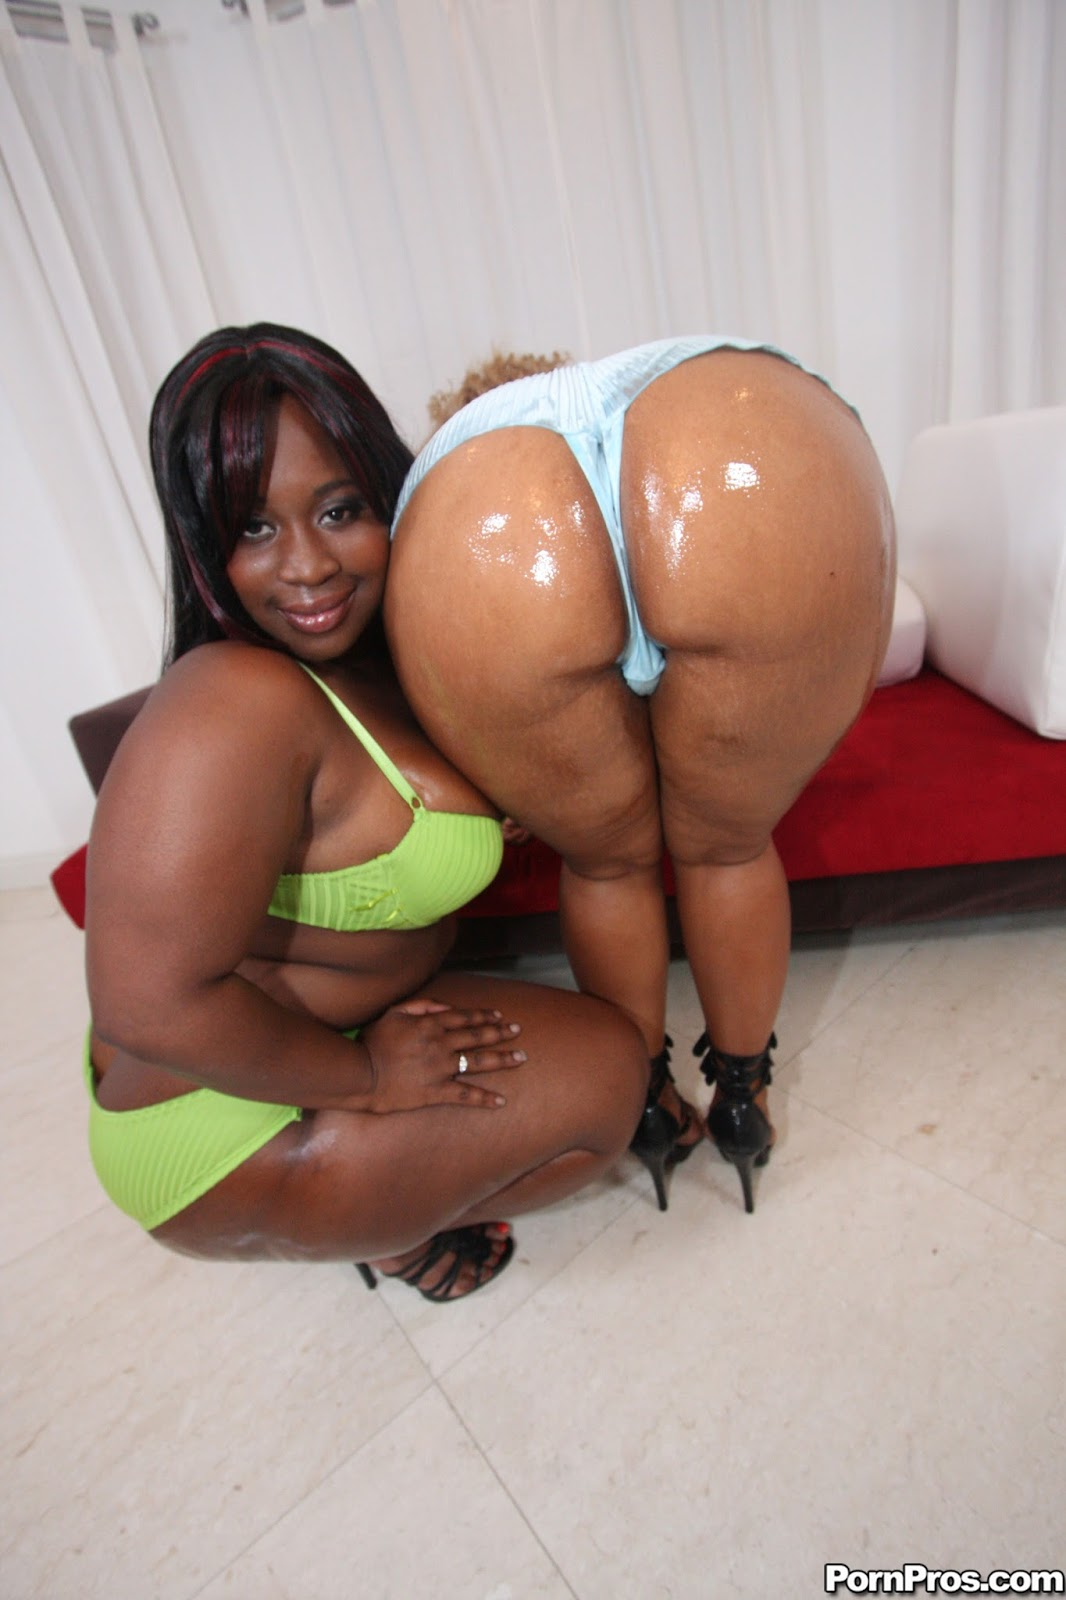 Busty women whipped